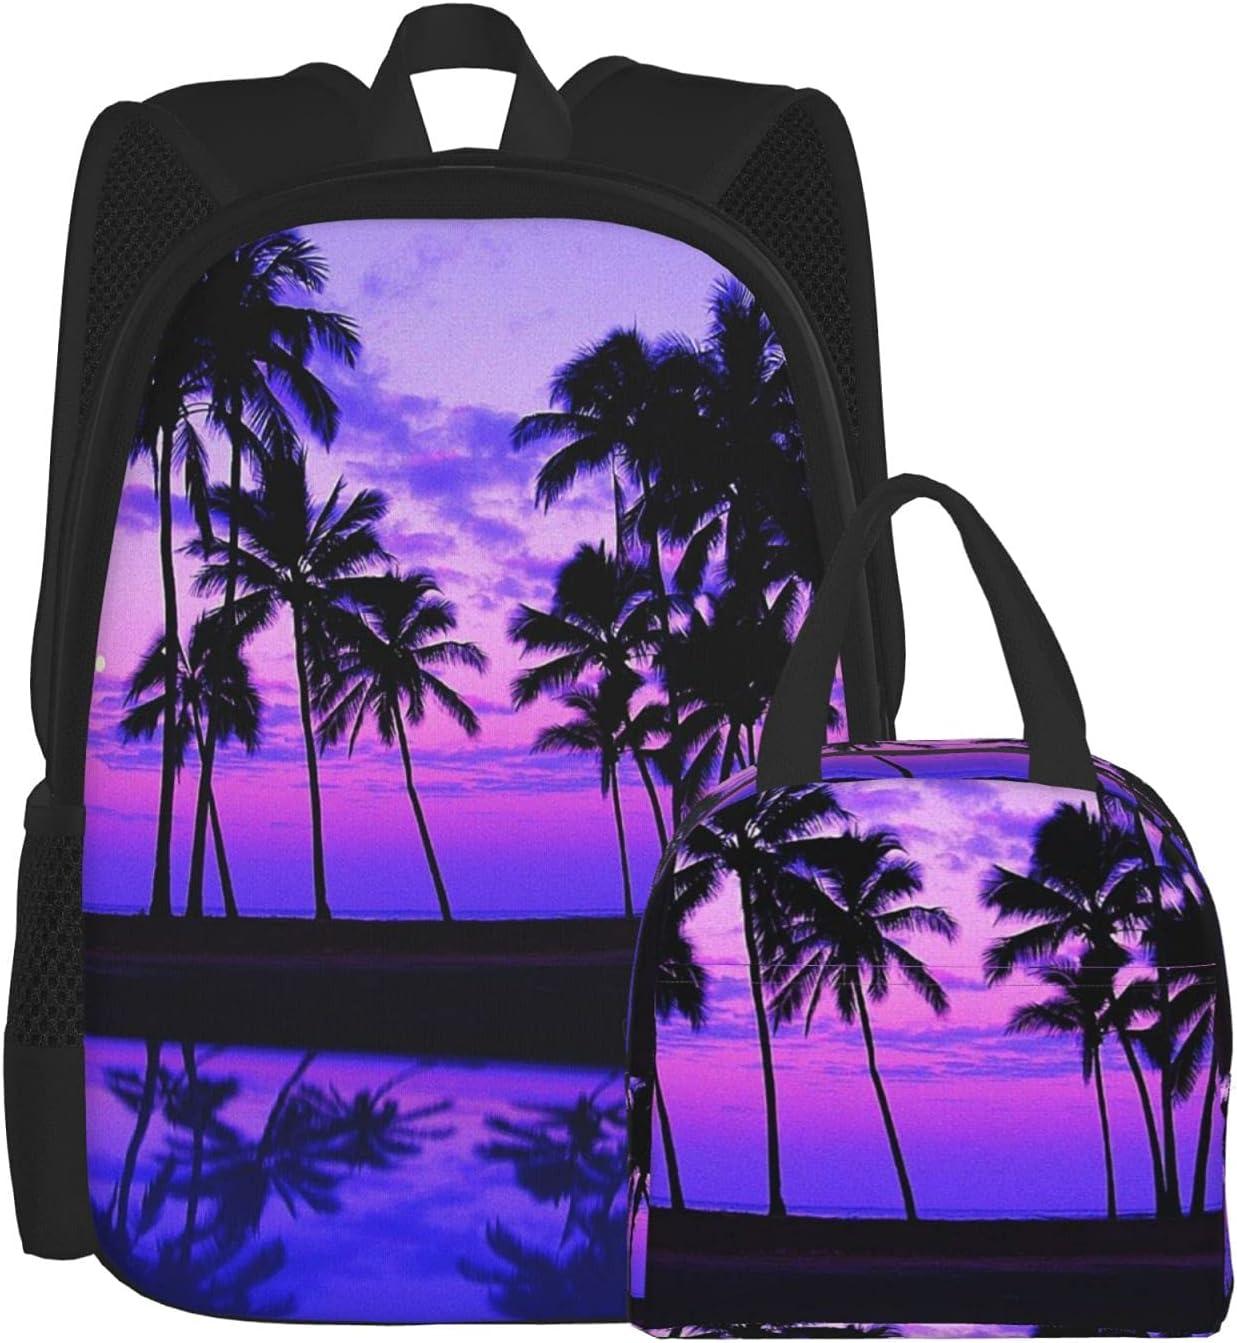 HOYOZE Free shipping Backpack Hawaii Purple Palm Tree Set Bag Sales Sunset Wa School